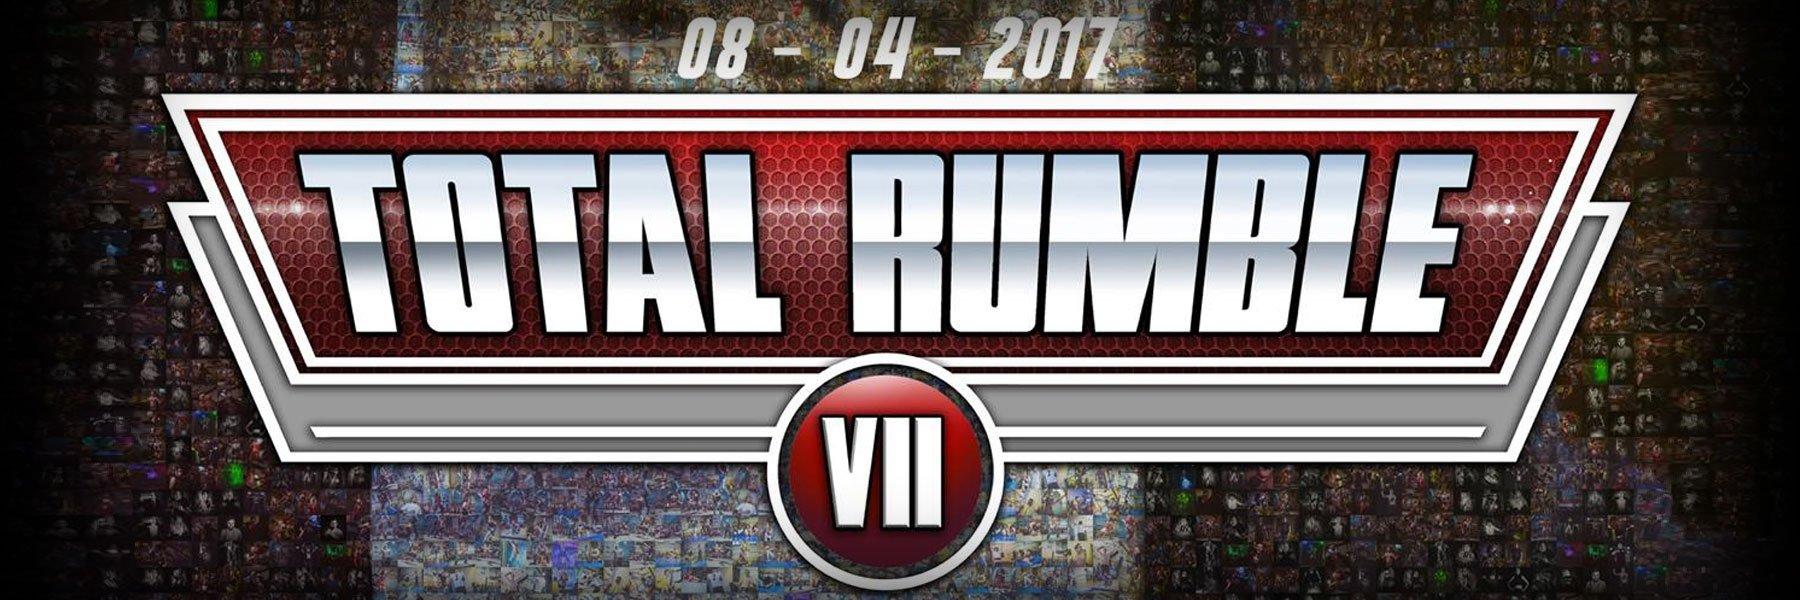 Total Rumble VII - Full Show